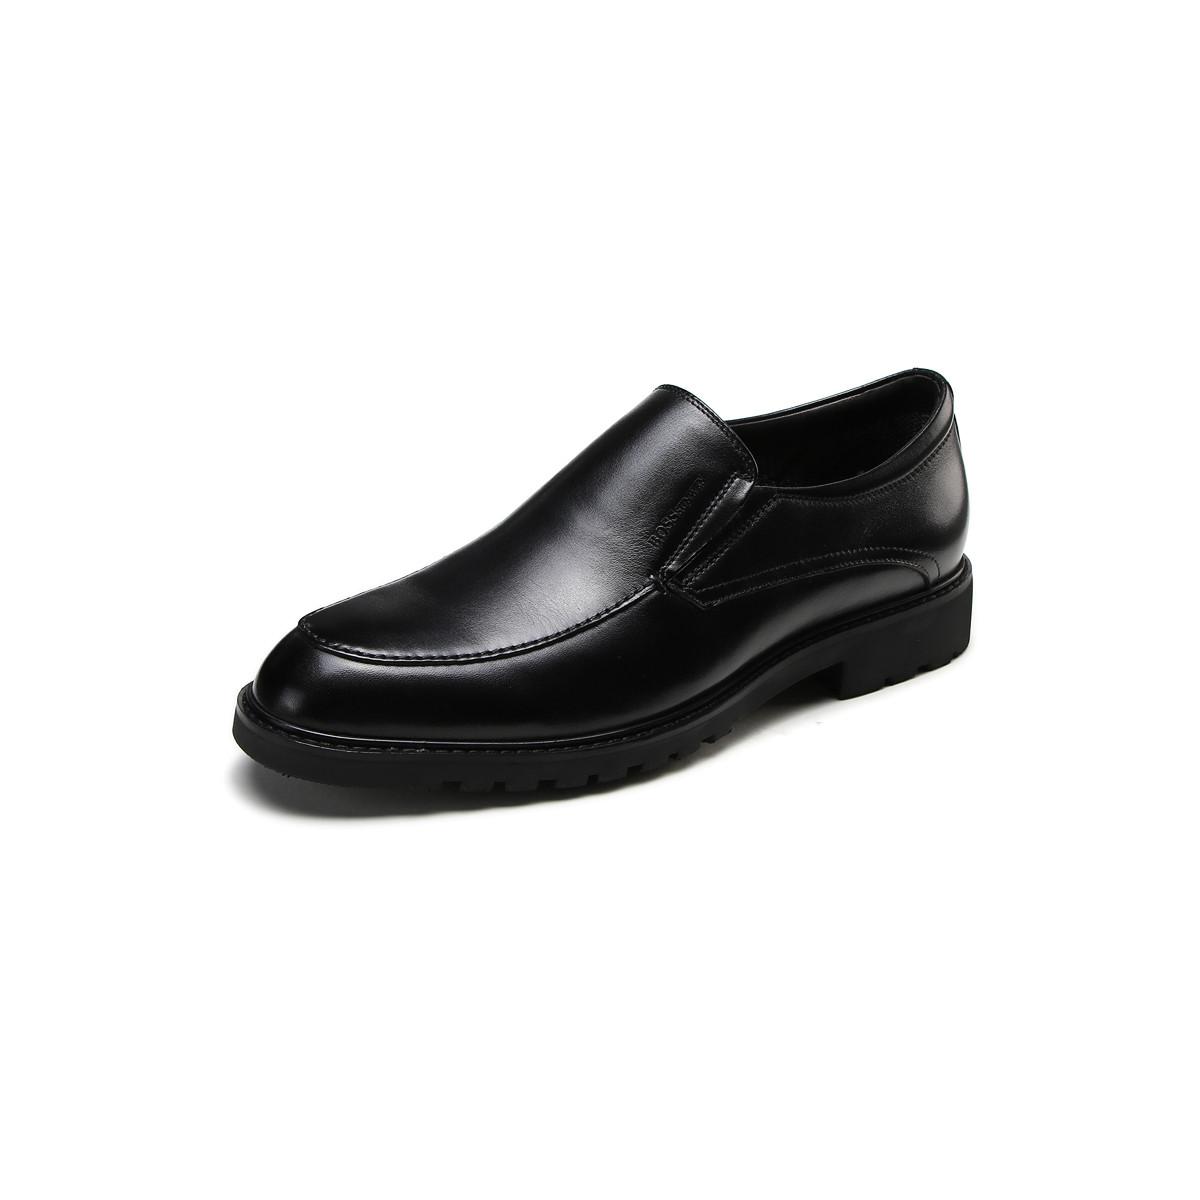 BOSSSUNWEN新品牛皮一脚蹬男士商务皮鞋男皮鞋男鞋男士皮鞋男鞋Q38DB8623A